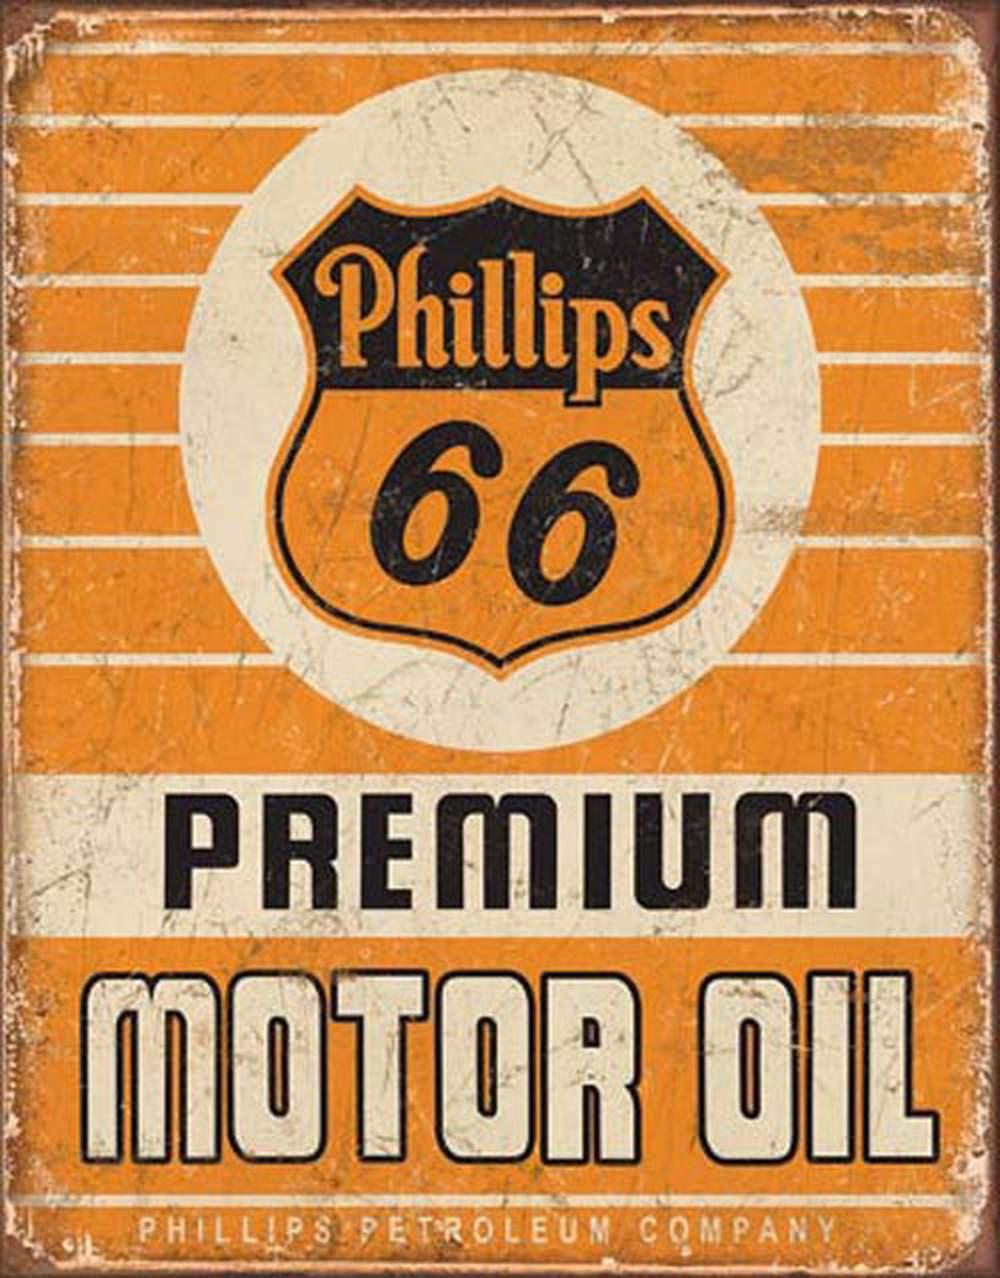 Tin Sign - Phillips 66 Premium Motor Oil